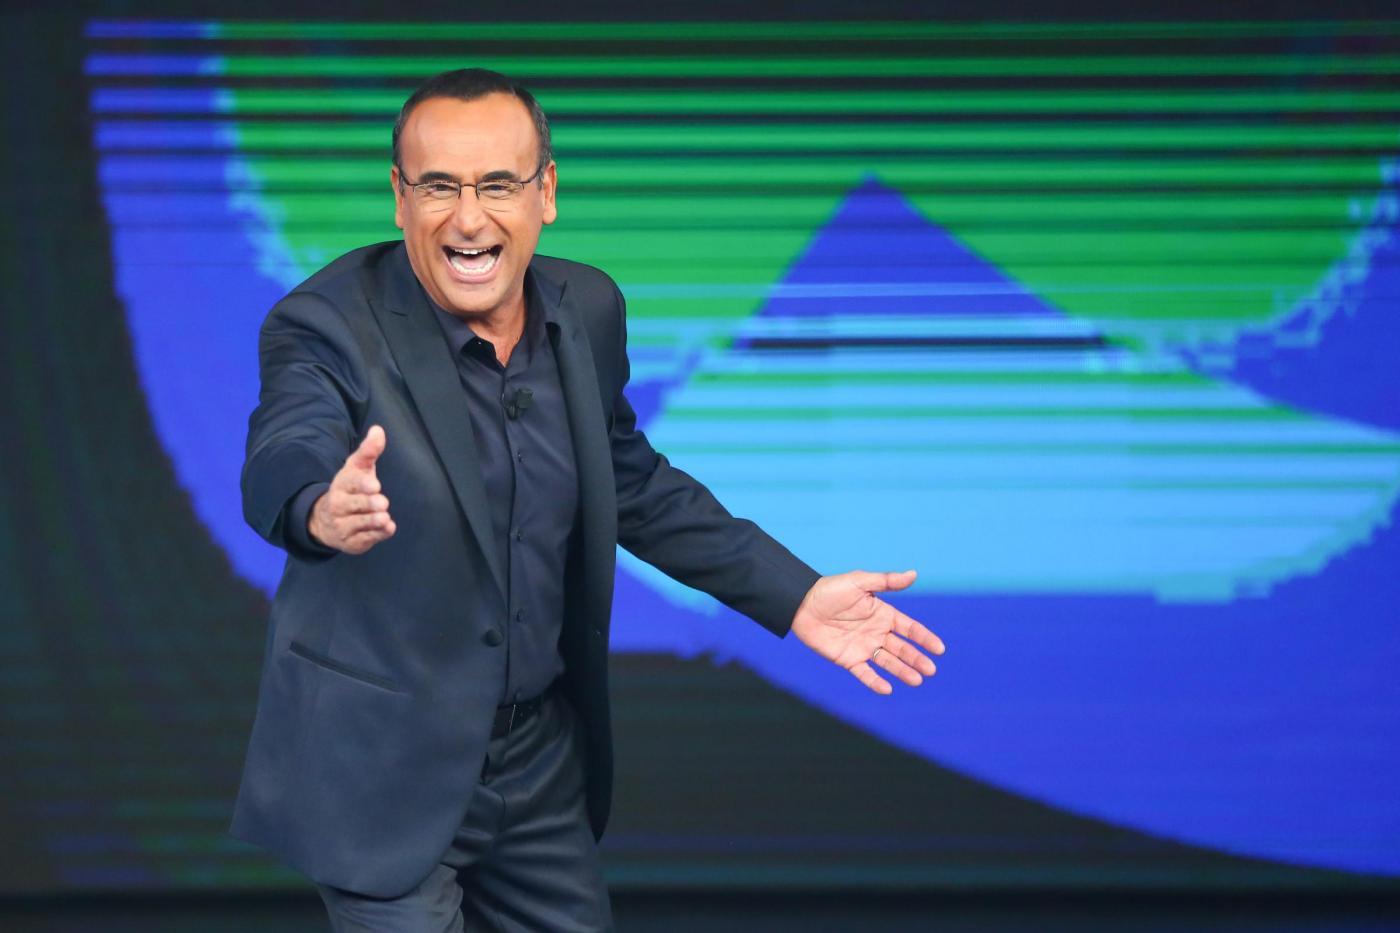 Sanremo 2017 vallette